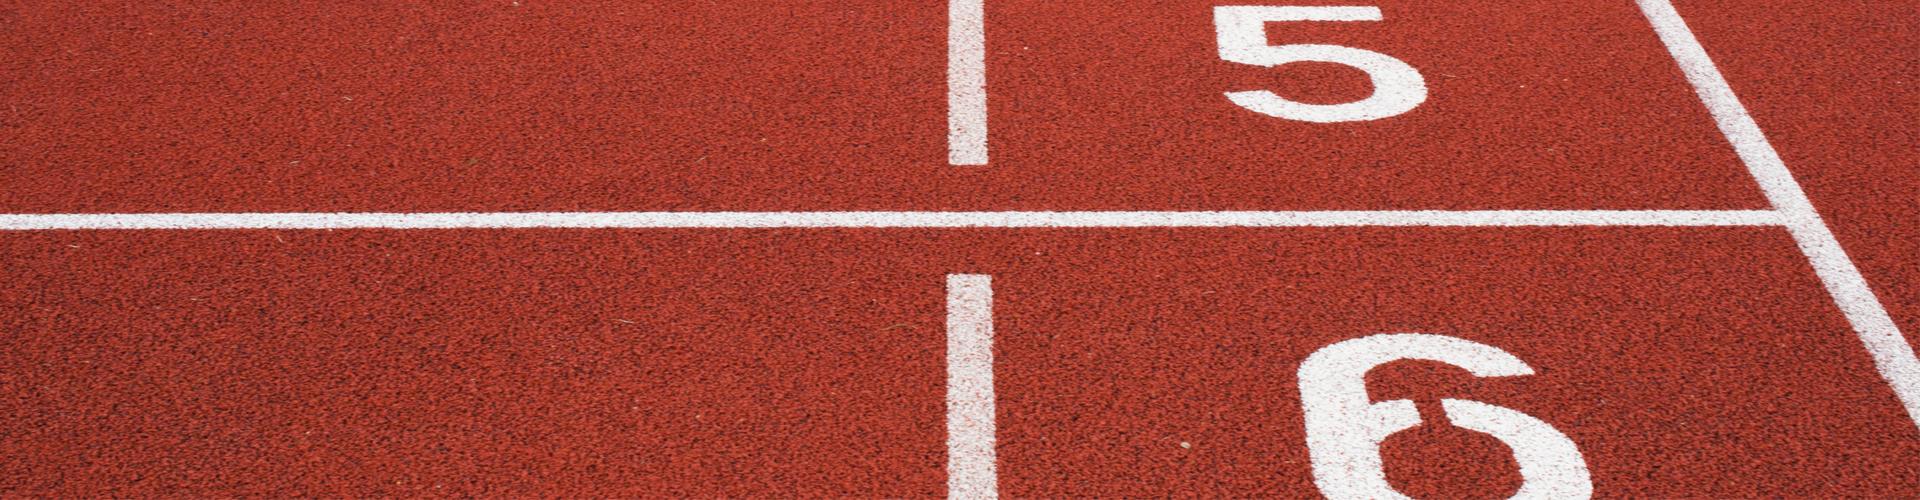 Sport Comune di Salve